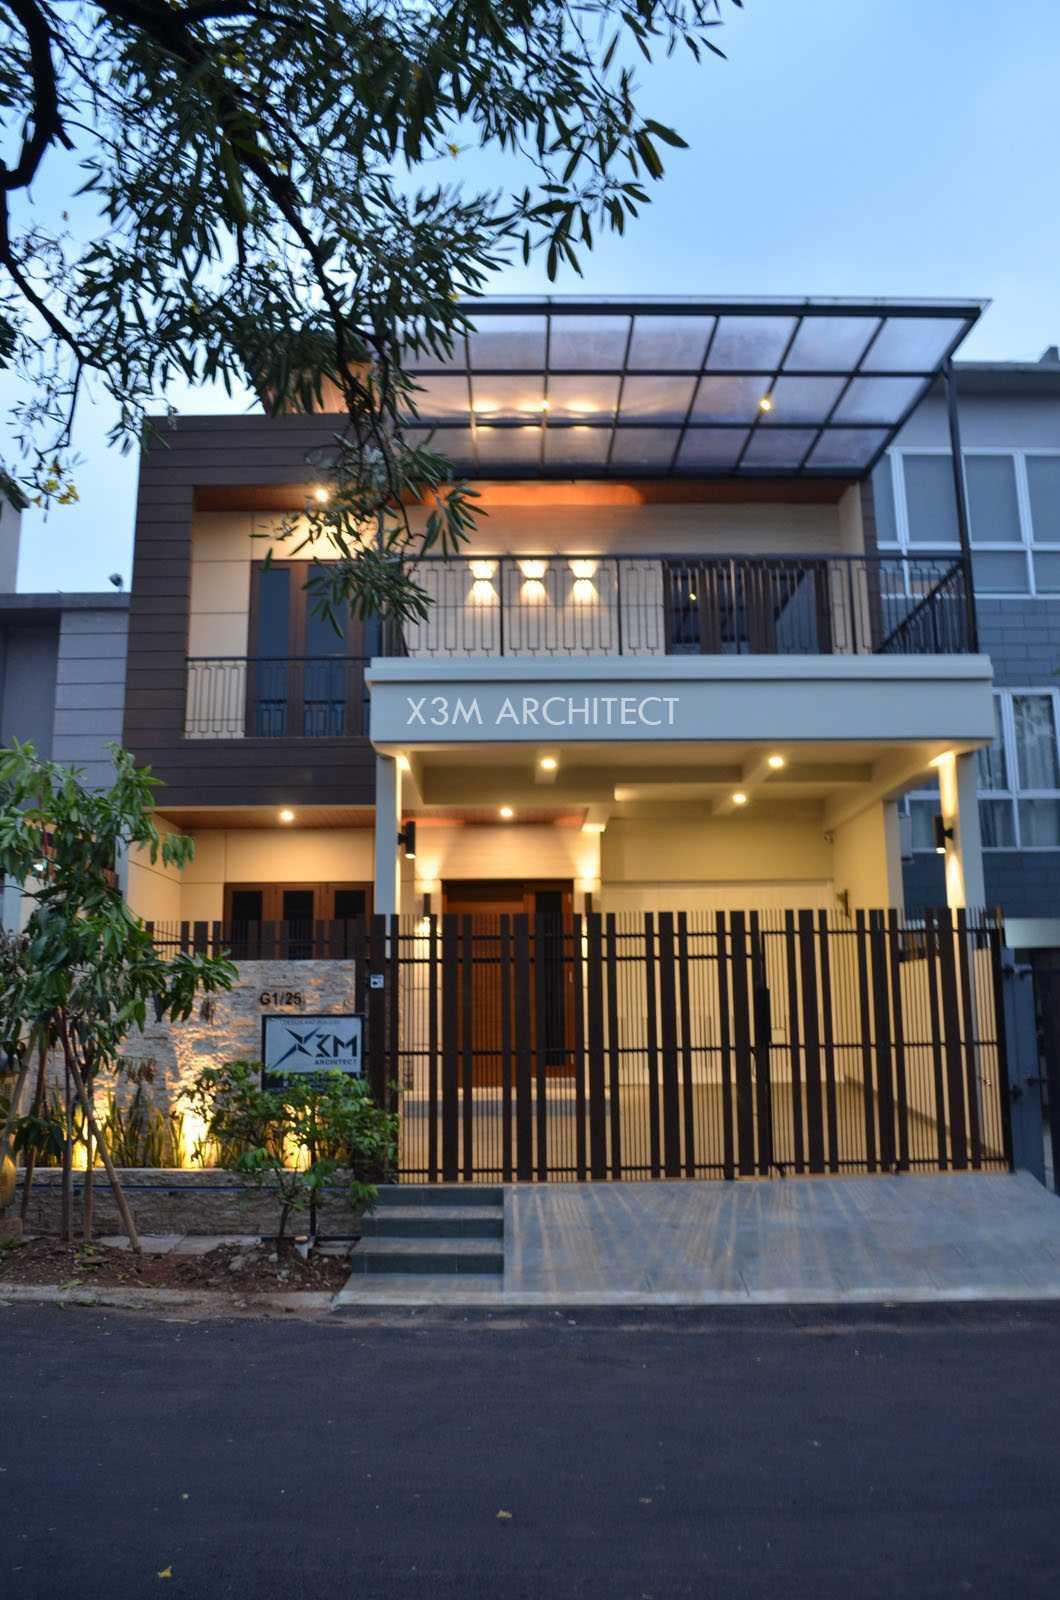 X3M Architects Gl Residence Berjaya Asia Bsd Office 2Th Floor Jl. Griya Loka Raya Bj-26, Rw. Buntu, Kec. Serpong, Kota Tangerang Selatan, Banten 15318, Indonesia Berjaya Asia Bsd Office 2Th Floor Jl. Griya Loka Raya Bj-26, Rw. Buntu, Kec. Serpong, Kota Tangerang Selatan, Banten 15318, Indonesia X3M-Architects-Gl-Residence  101574